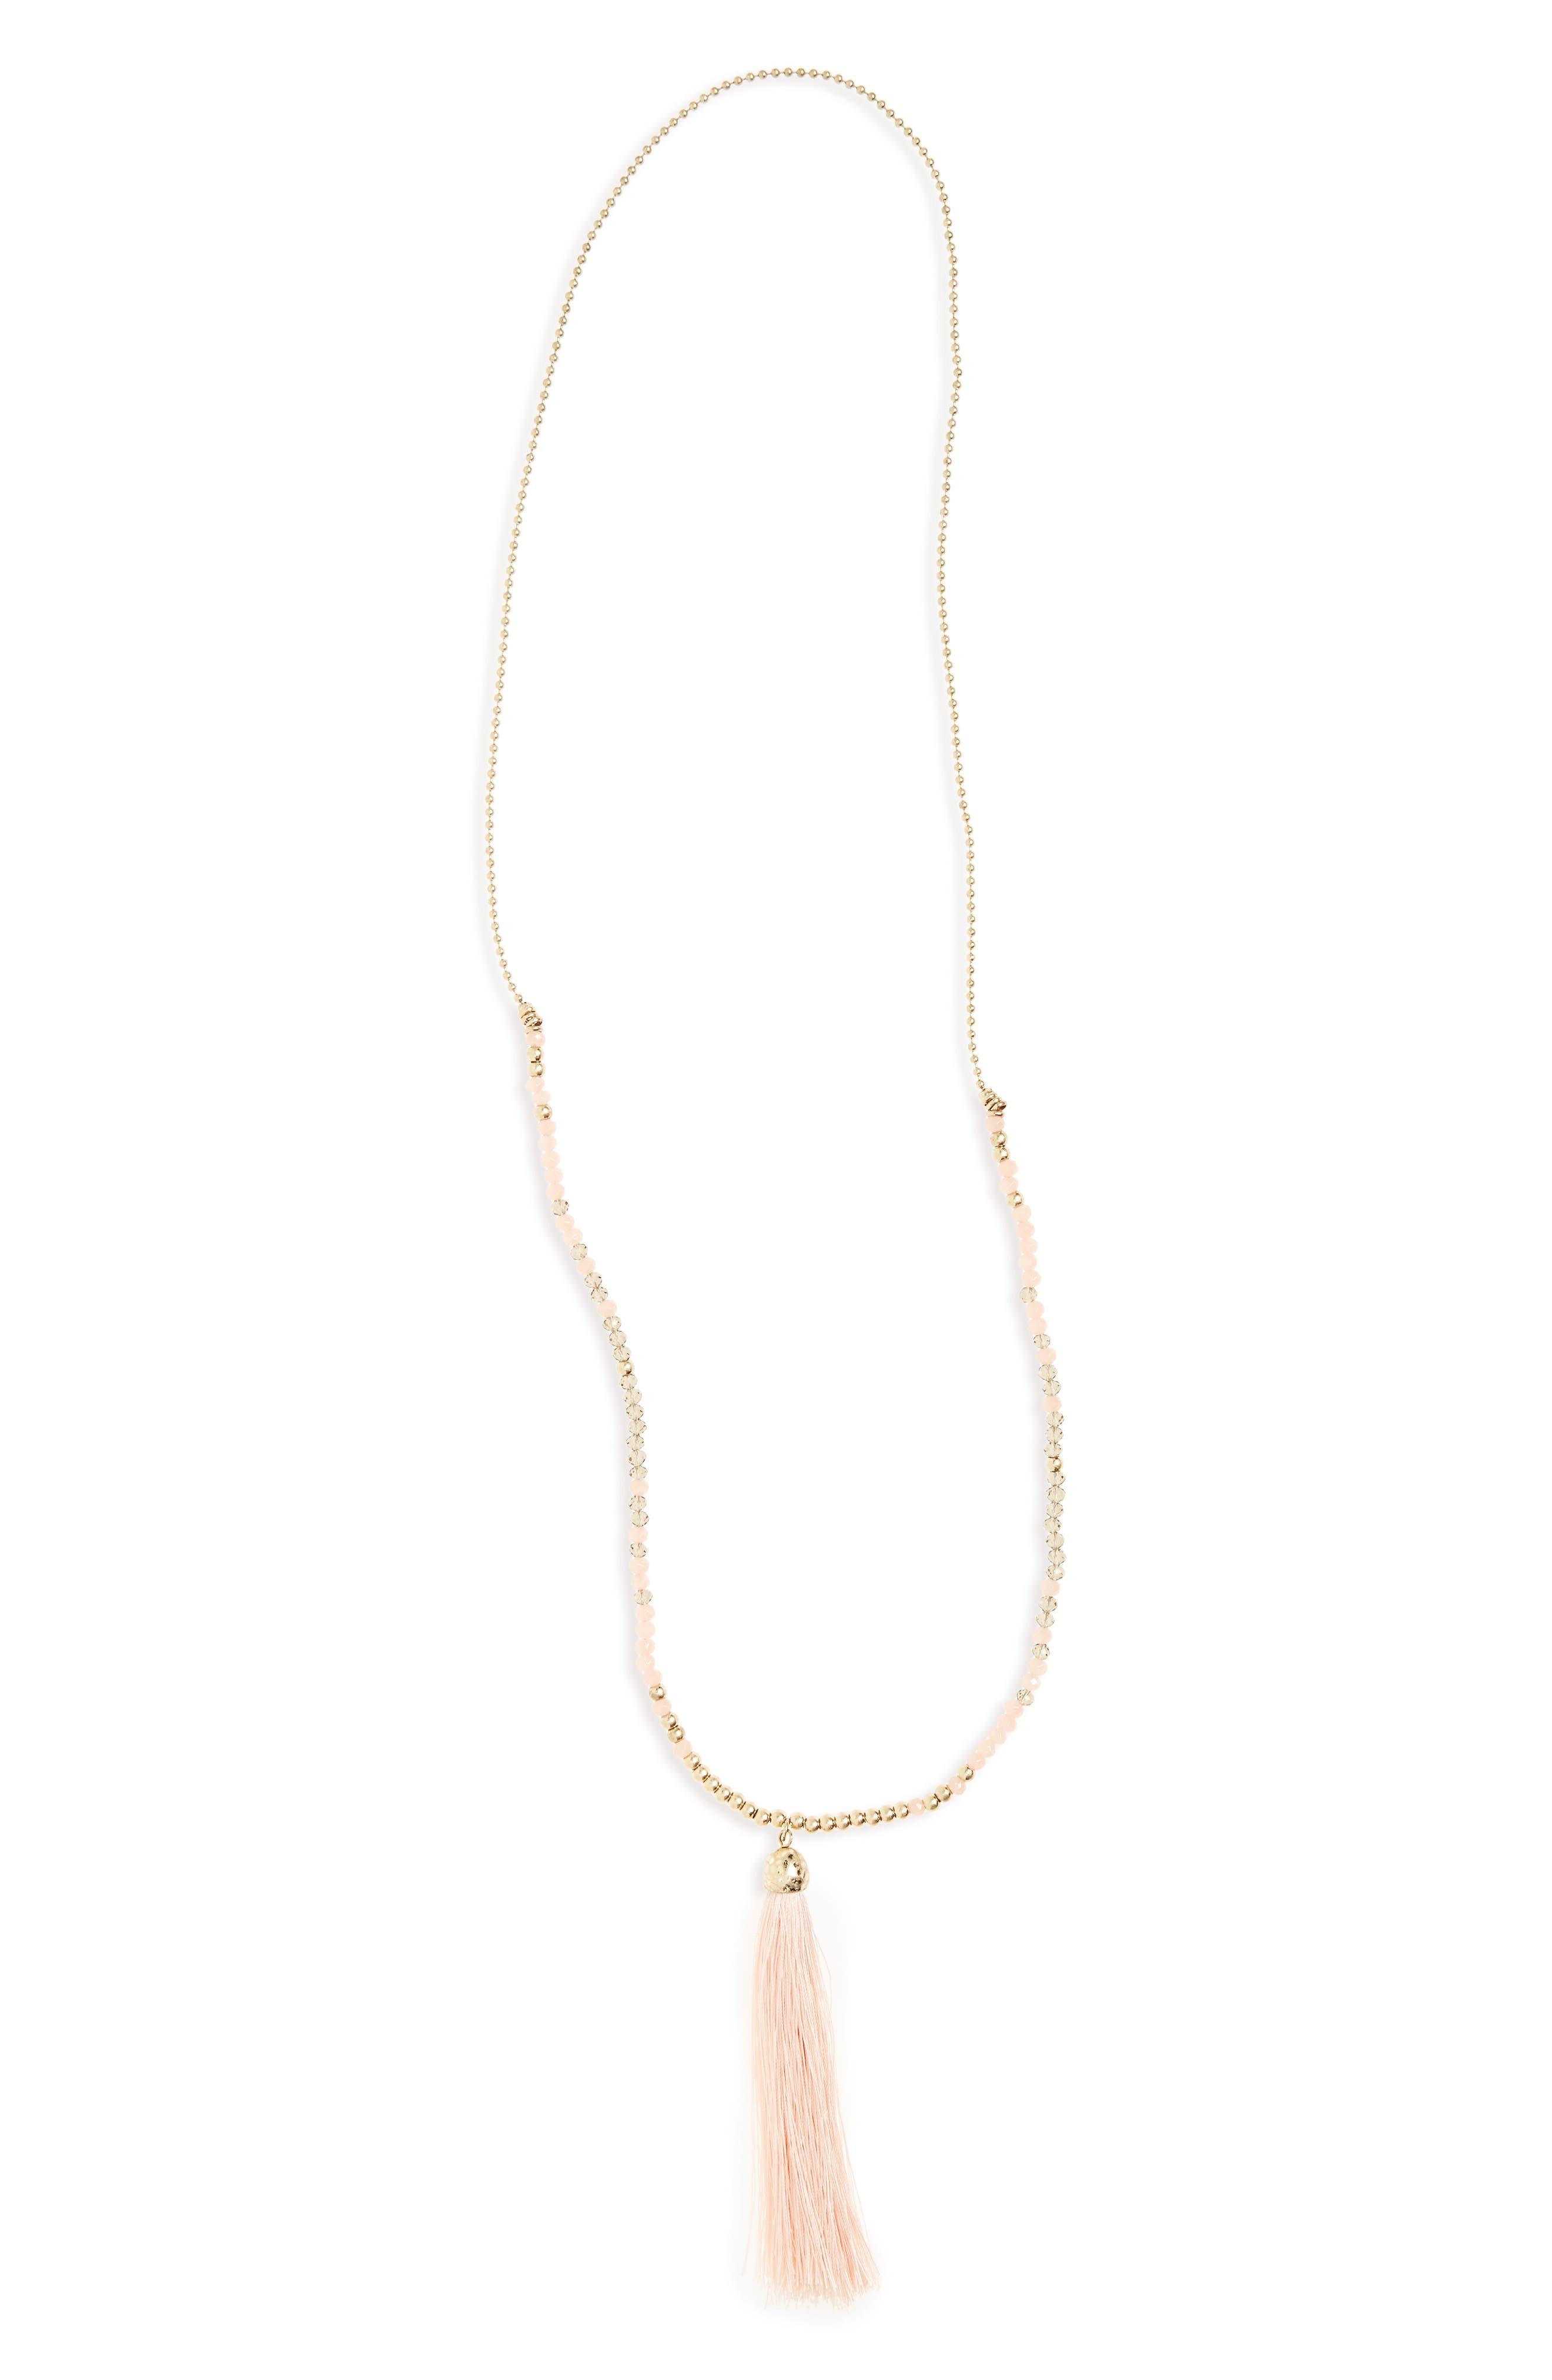 Beaded Necklace,                             Main thumbnail 1, color,                             Peach/ Grey